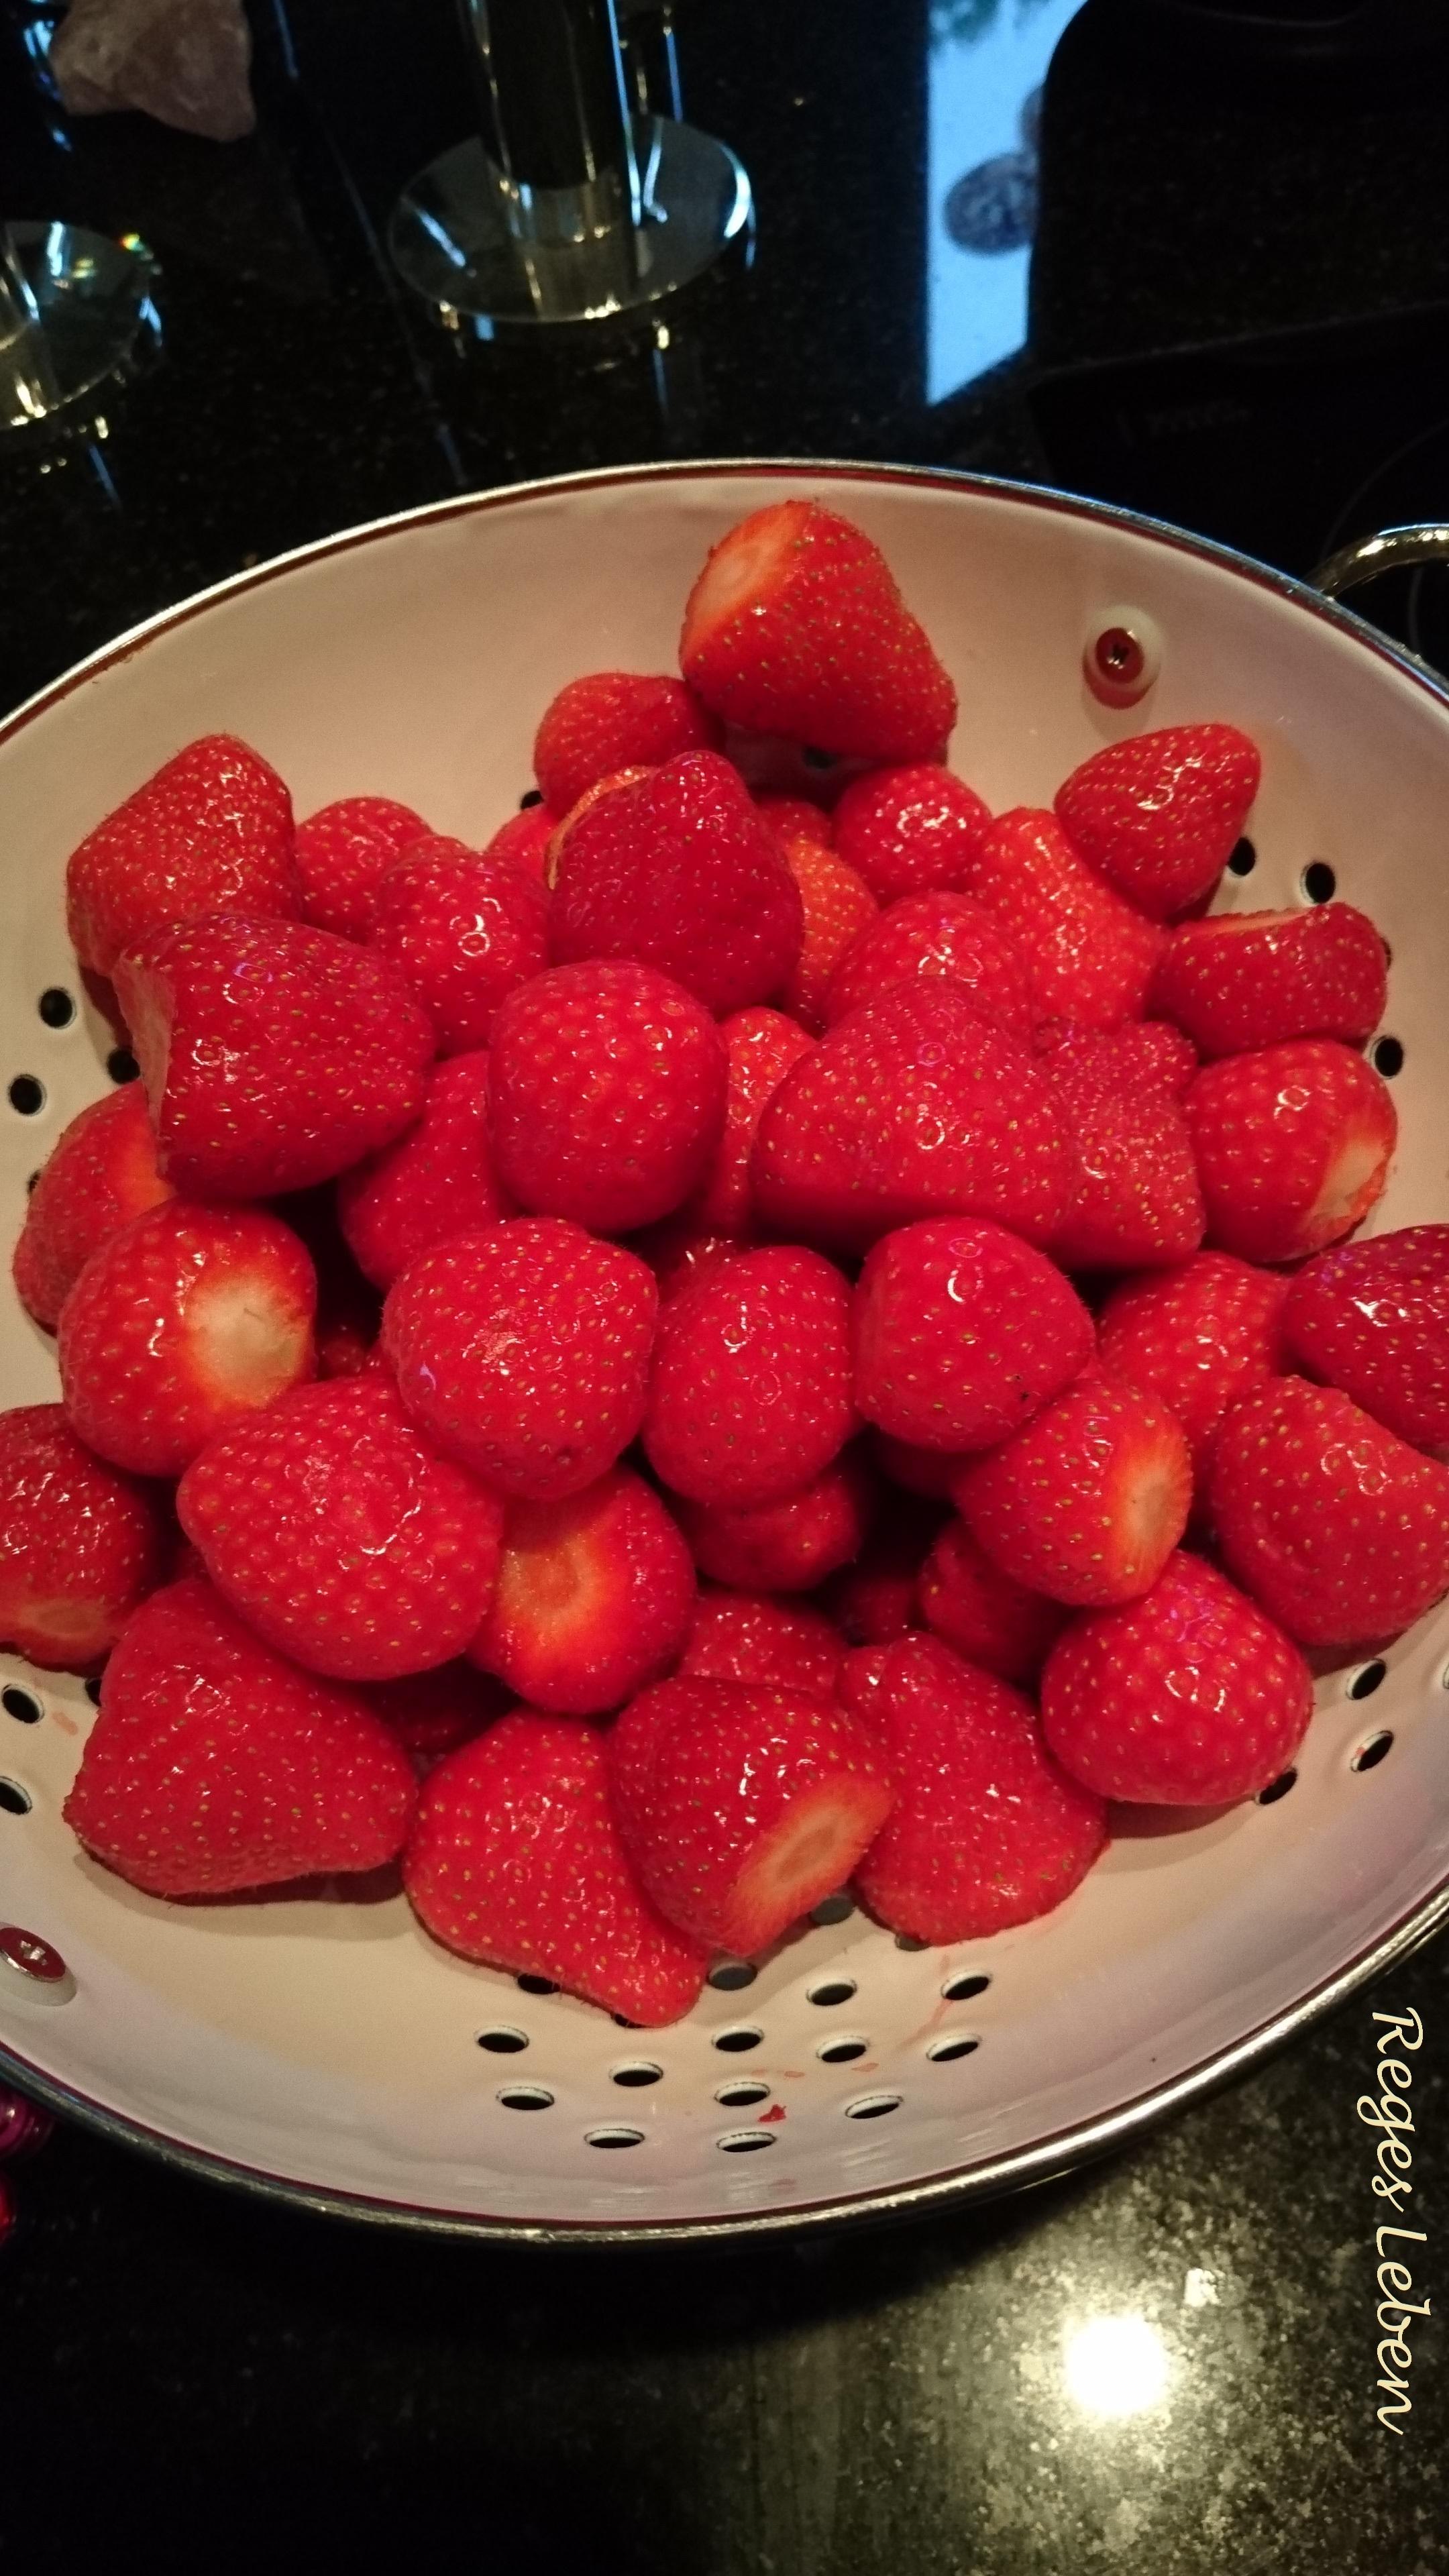 Erdbeerkuchen Erdbeeren Vom Blech Strawbeery Cake Reges Leben